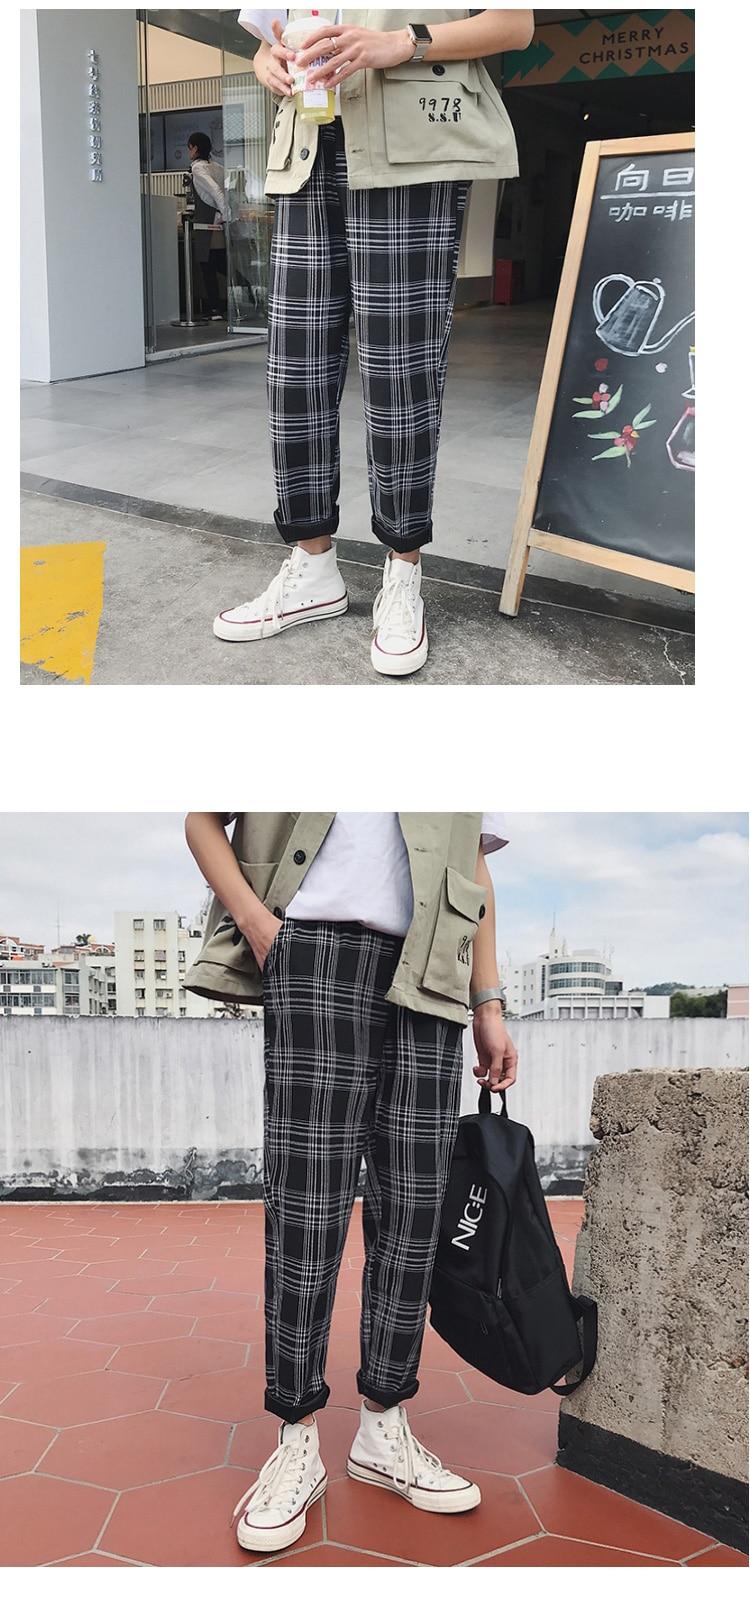 LAPPSTER Streetwear Yellow Plaid Pants Men Joggers 19 Man Casual Straight Harem Pants Men Korean Hip Hop Track Pants Plus Size 12